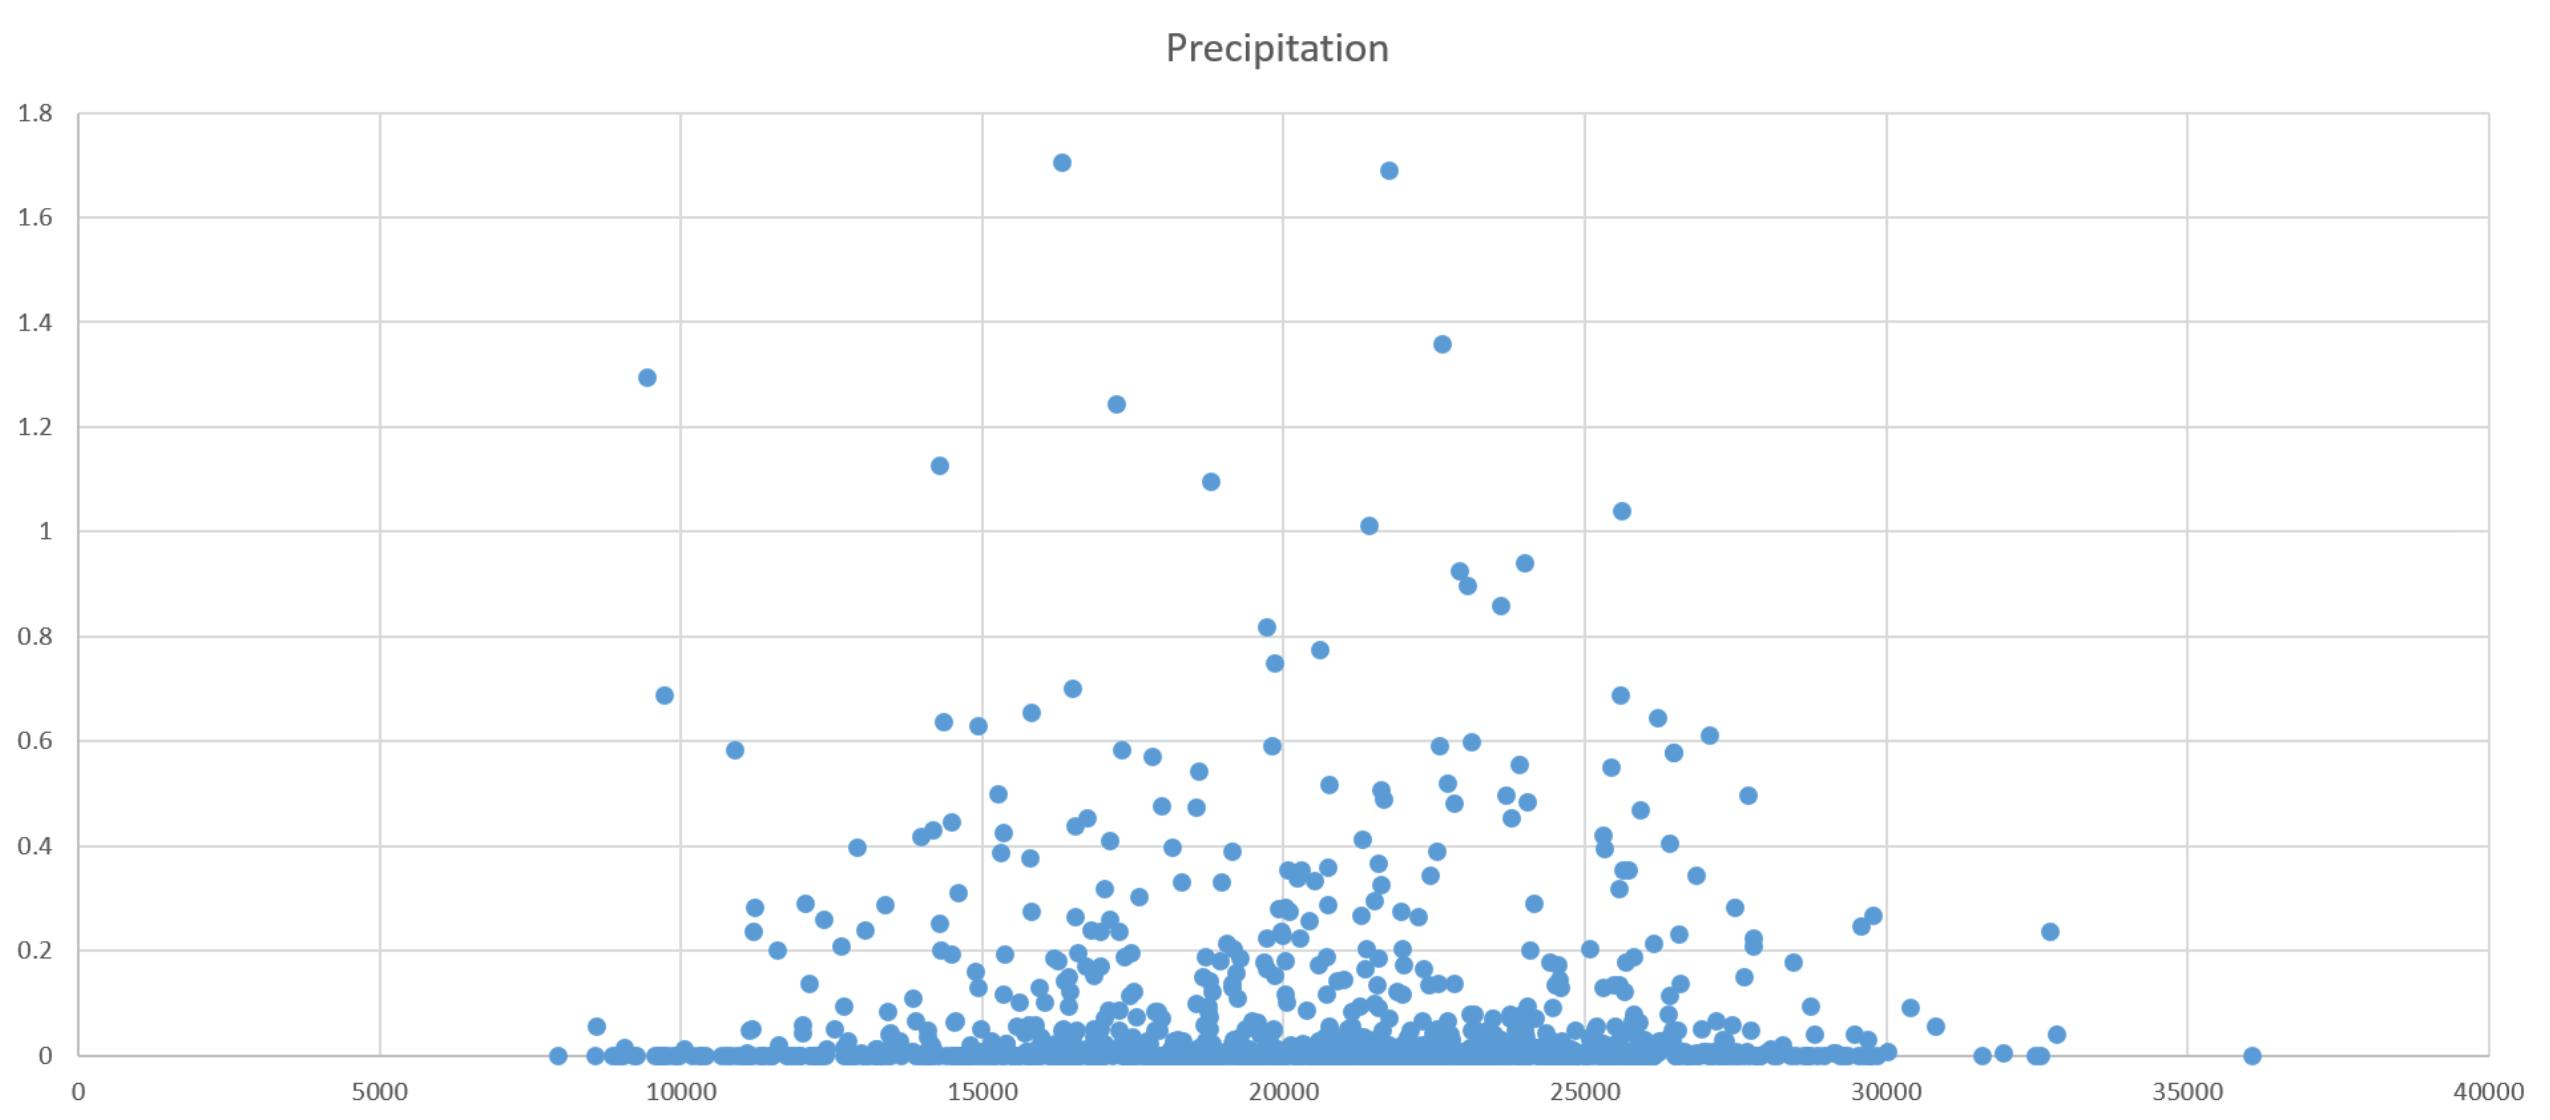 Visitors vs. Precipitation